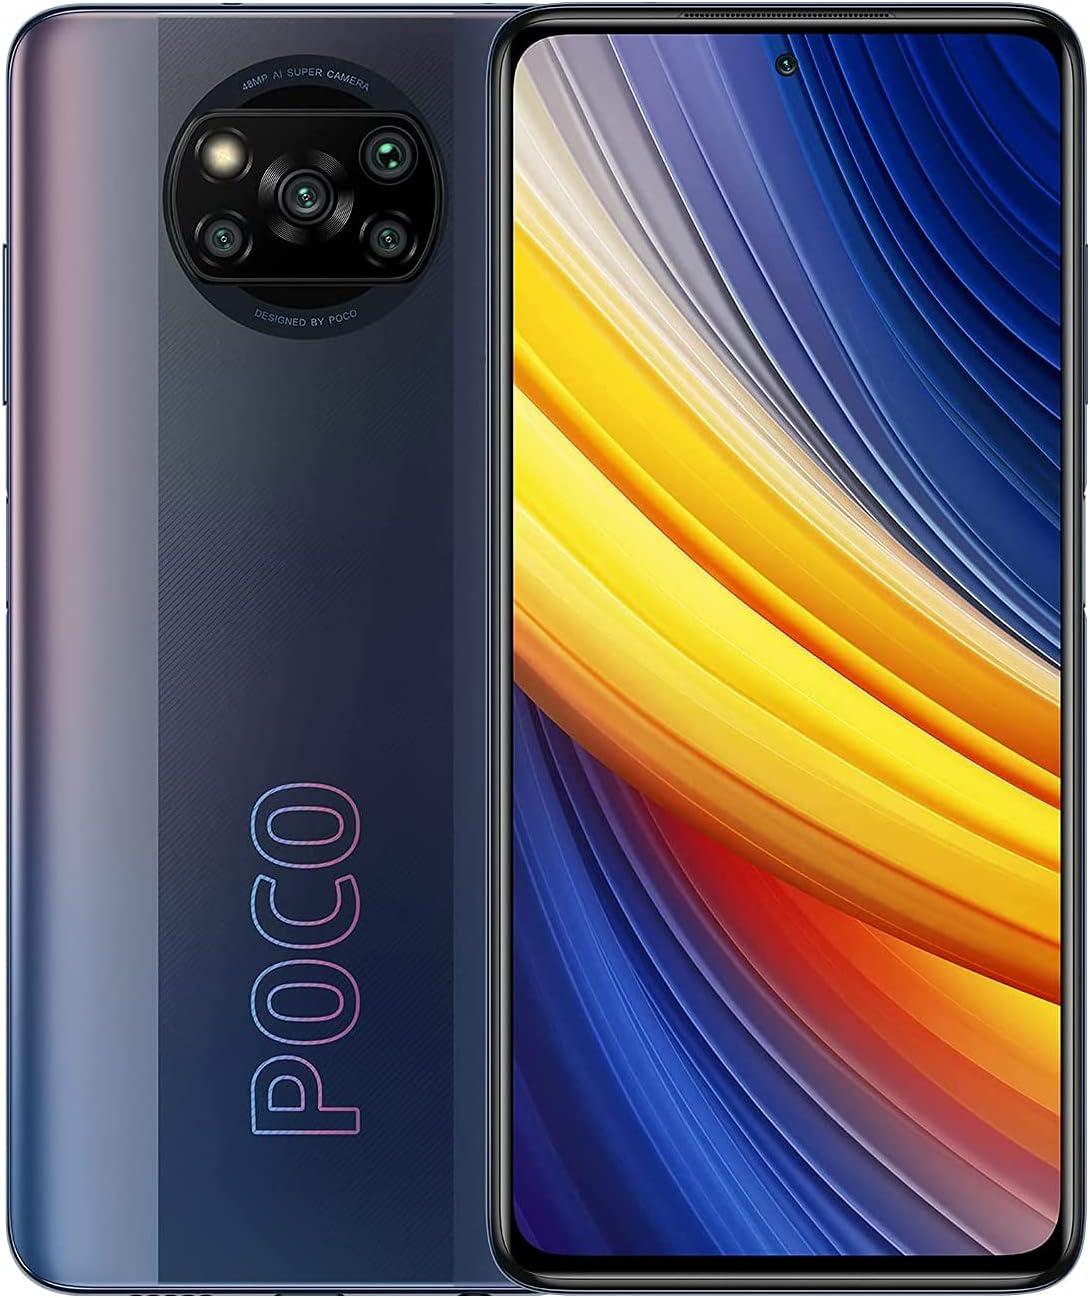 "Xiaomi POCO X3 Pro - Smartphone 6+128 GB, 6,67"" 120Hz FHD+DotDisplay, Dual Sim, Snapdragon 860, Cámara Cuádruple de 48 MP, 5160 mAh, Fantasma Negro"